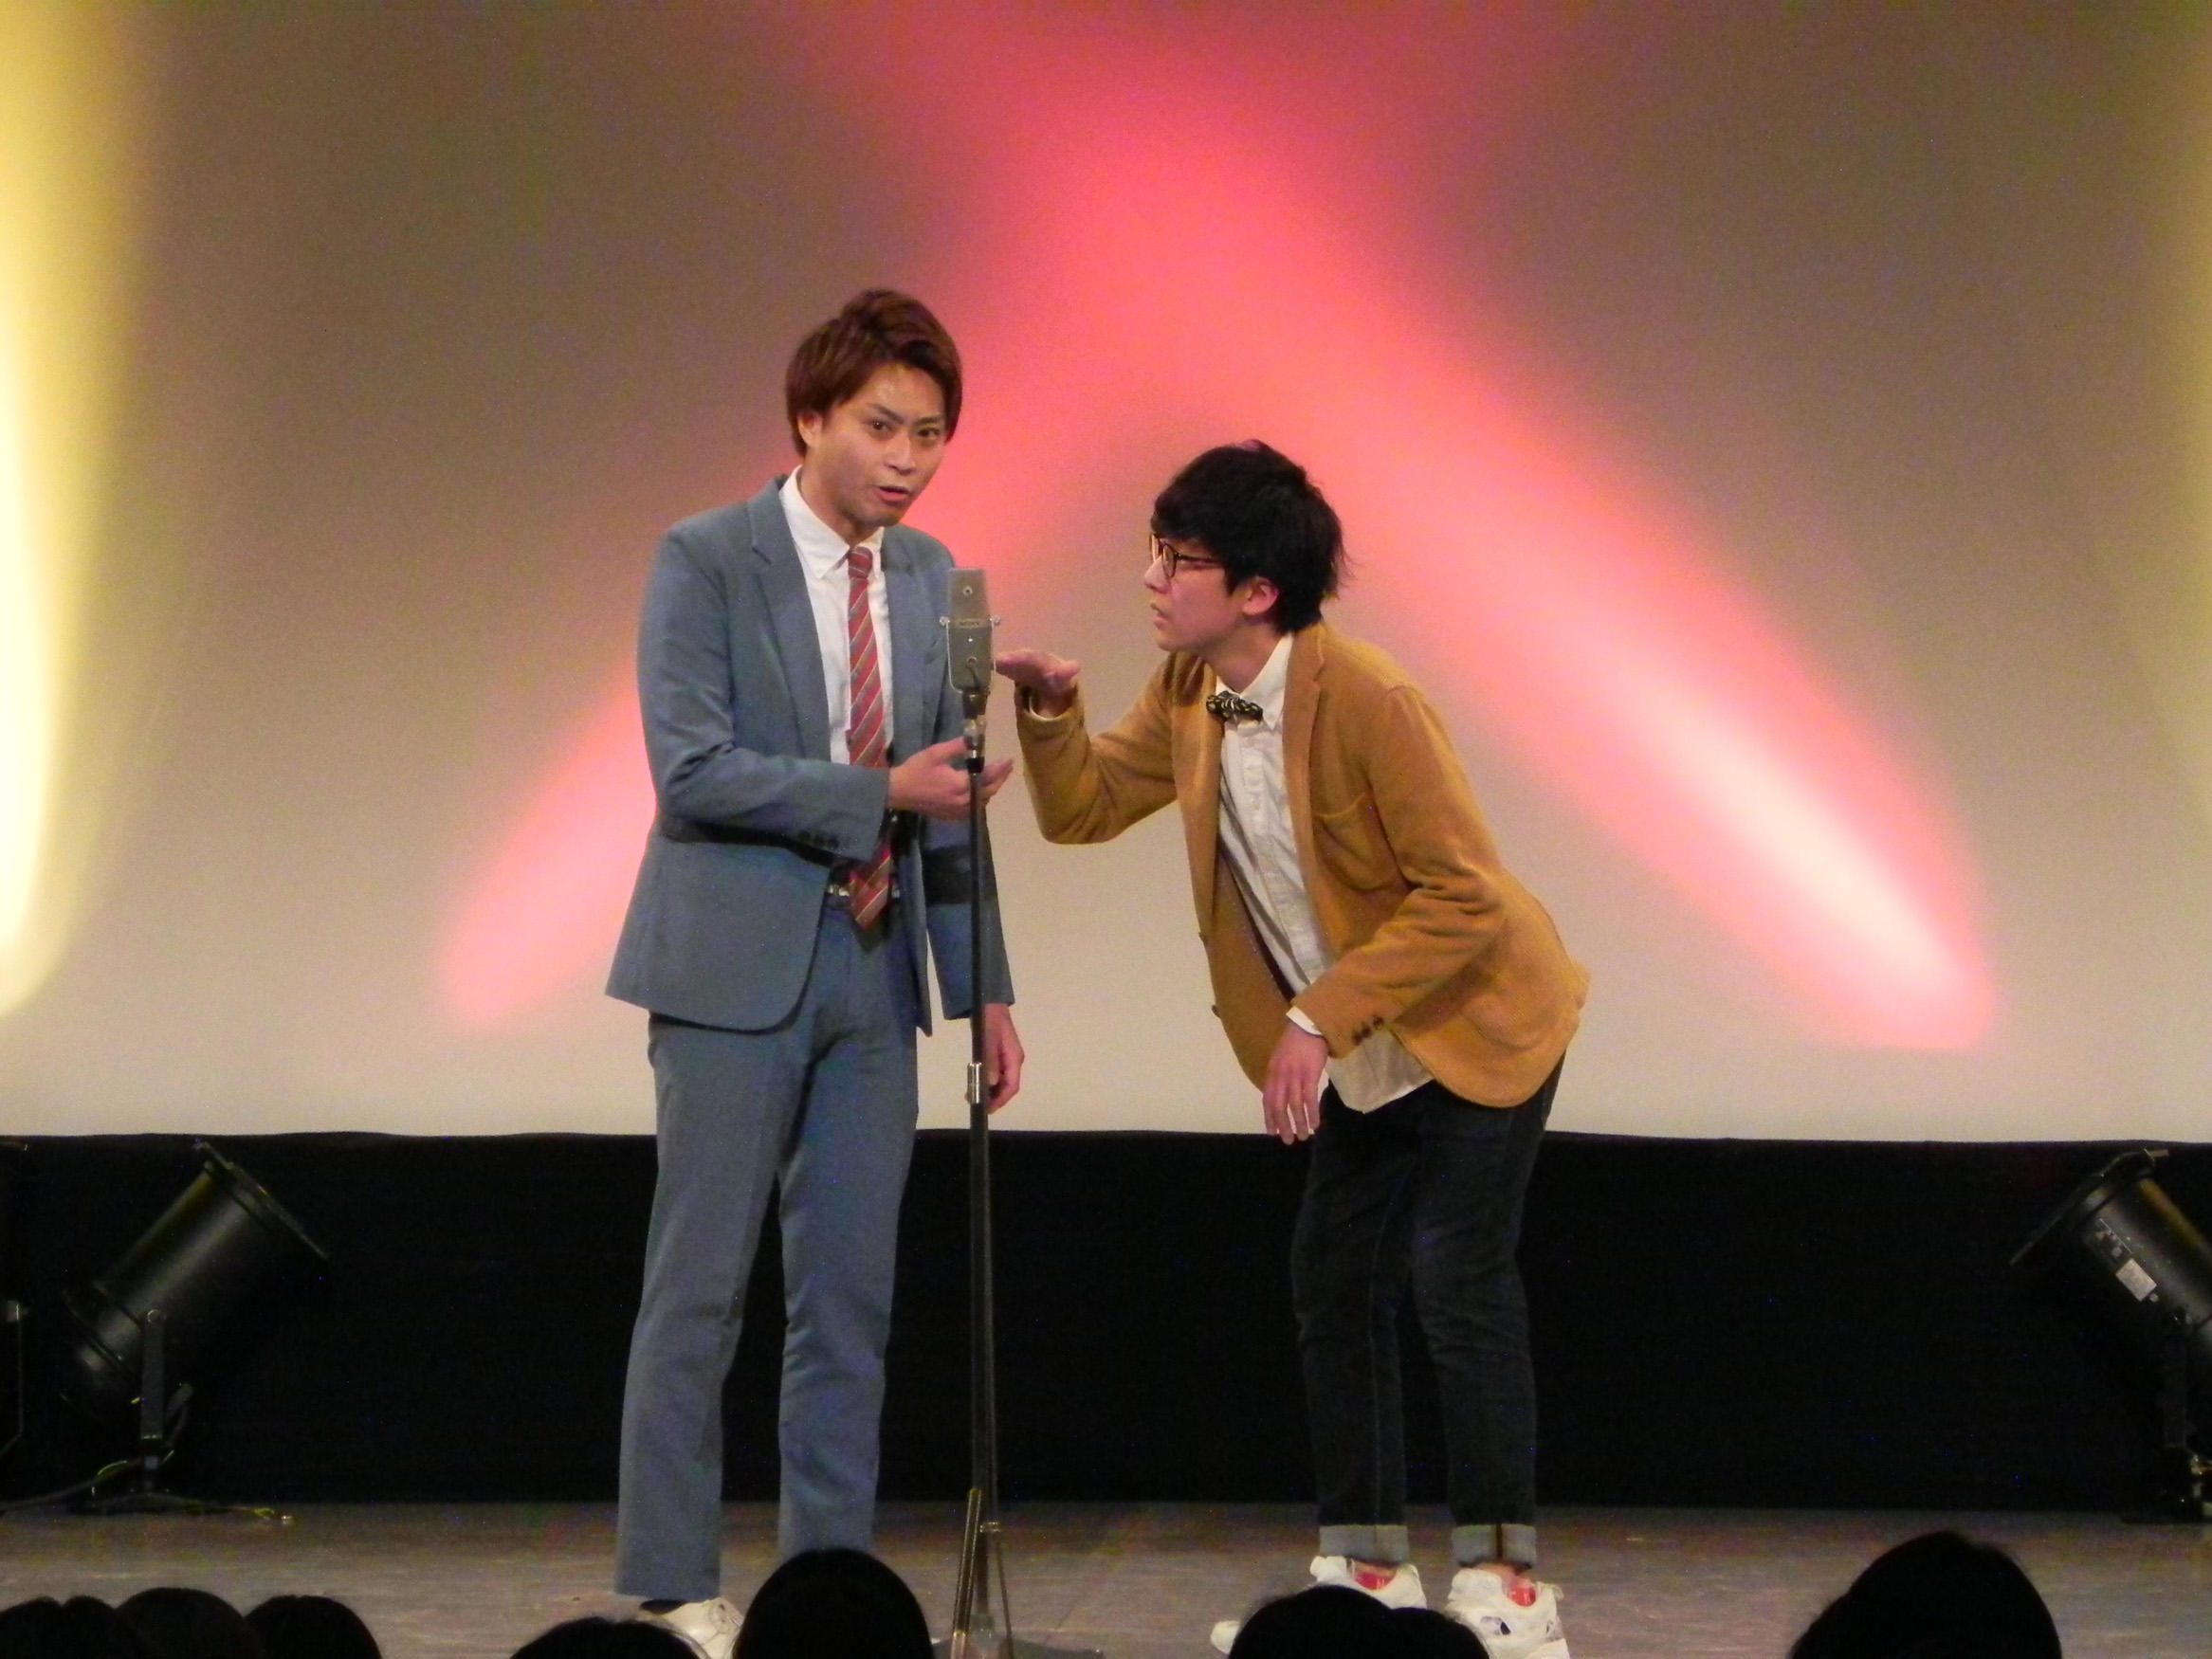 http://news.yoshimoto.co.jp/20170425152146-8659aaf431ff00f1cf77b5814eabf101adcaafbf.jpg